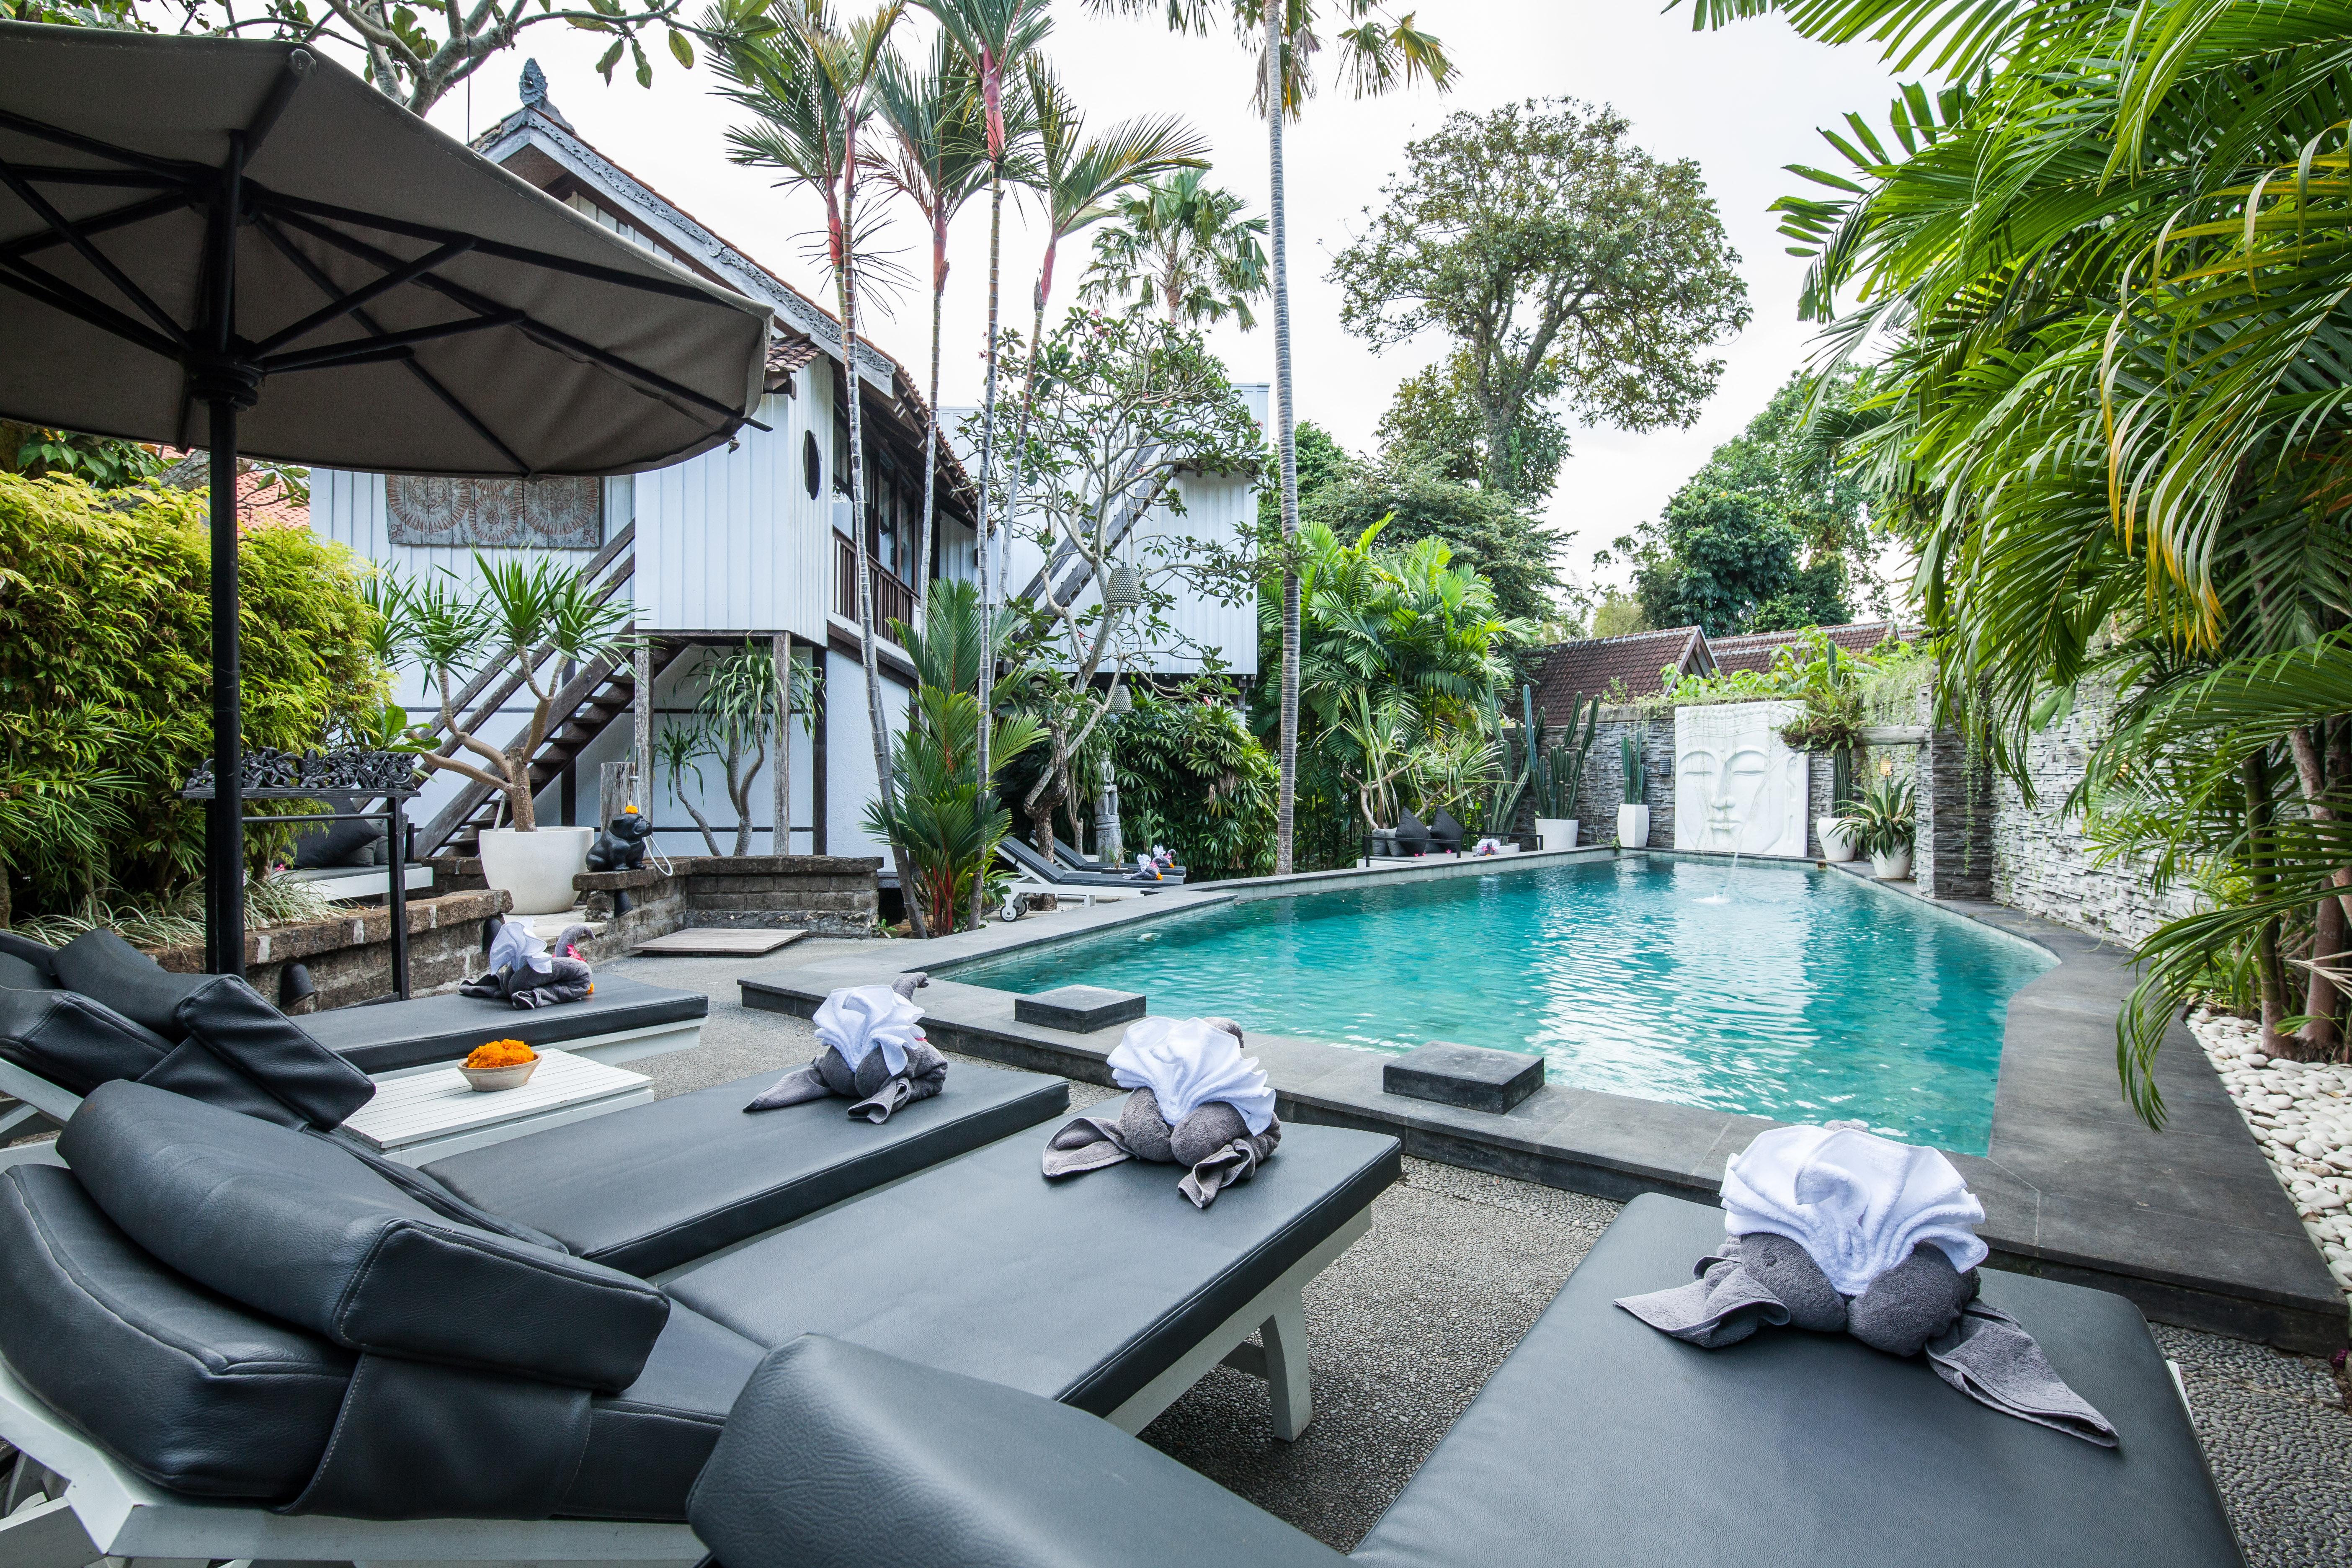 Balinb | Villa Sembunyi